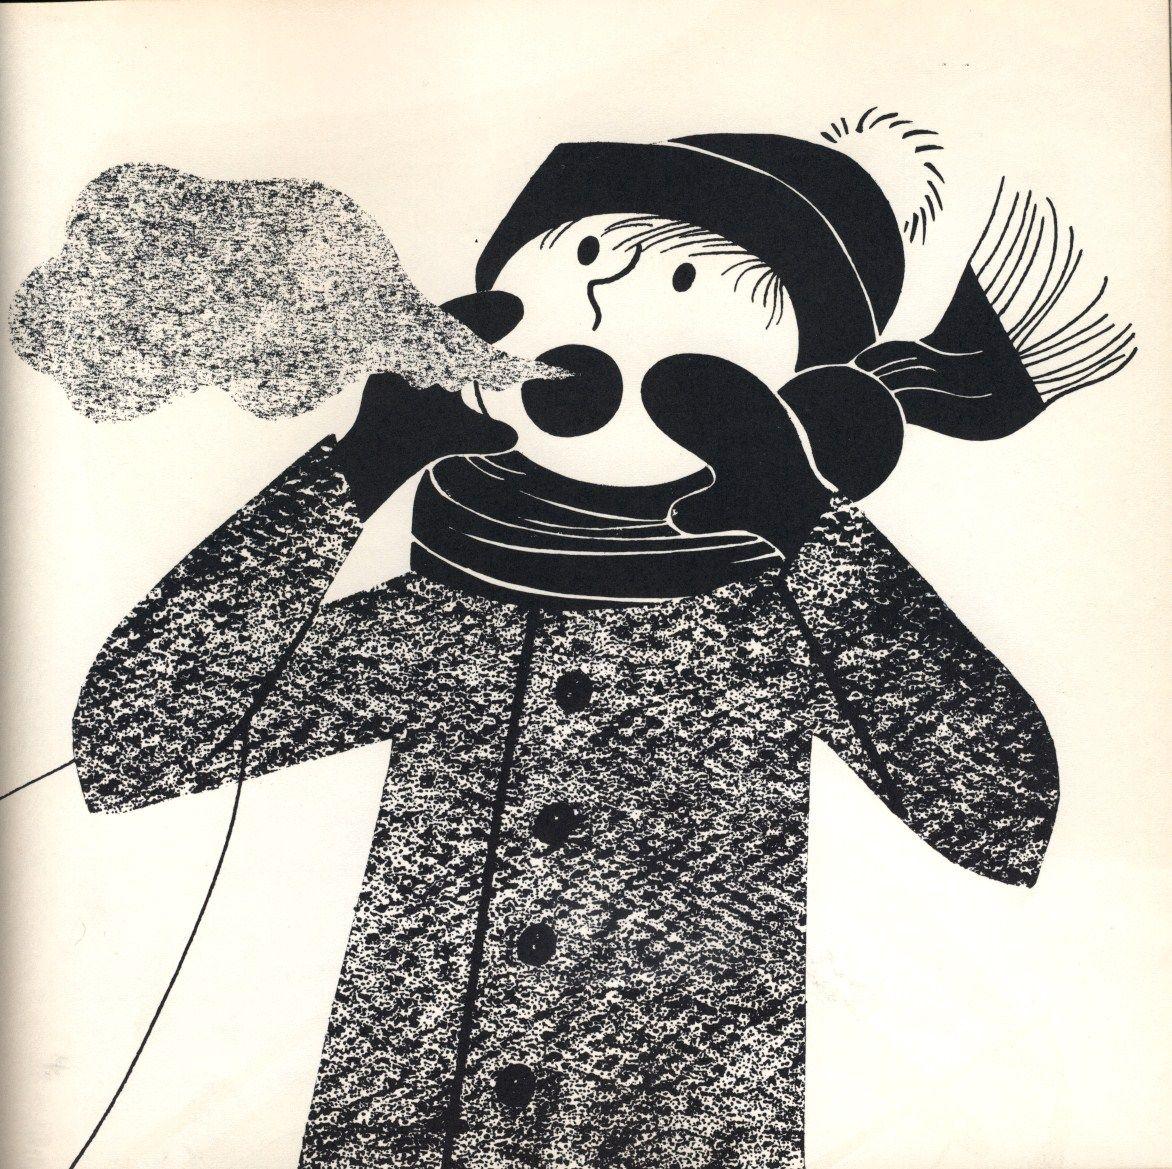 Midcenturymoderndesign Vintage Illustration Art Childrens Books Illustrations Modern Graphic Design